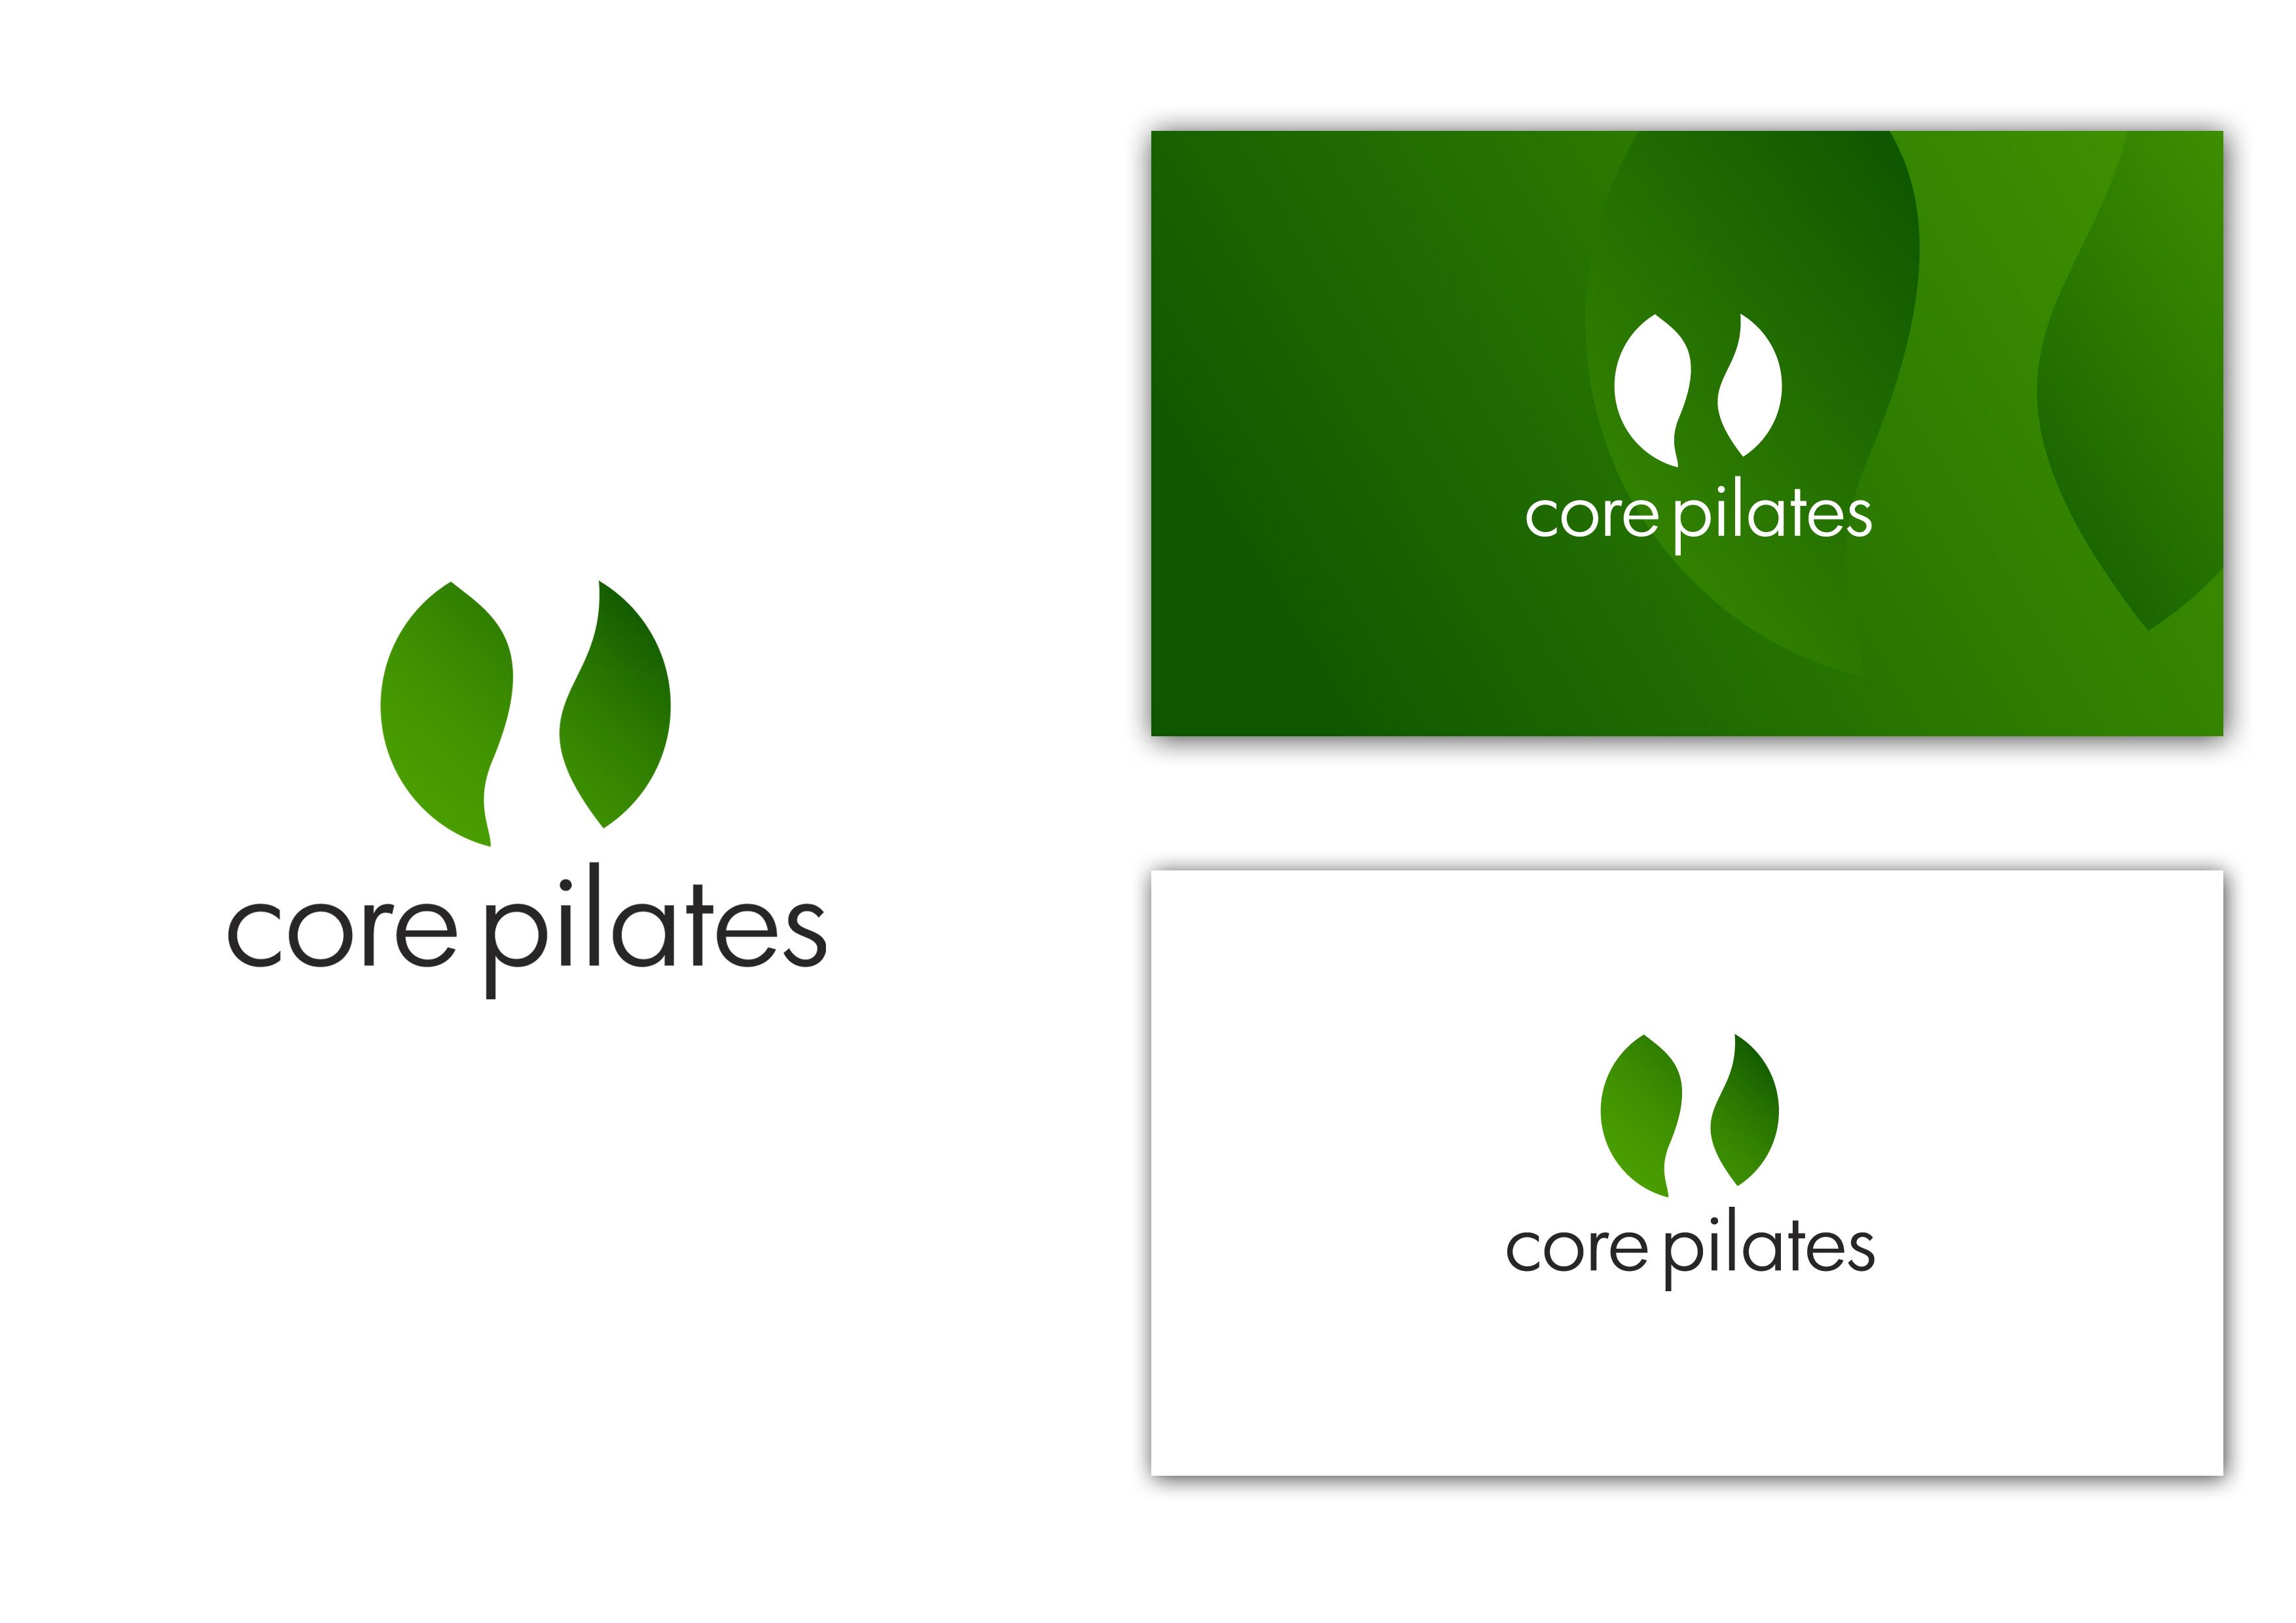 Logo Design by Osi Indra - Entry No. 88 in the Logo Design Contest Core Pilates Logo Design.